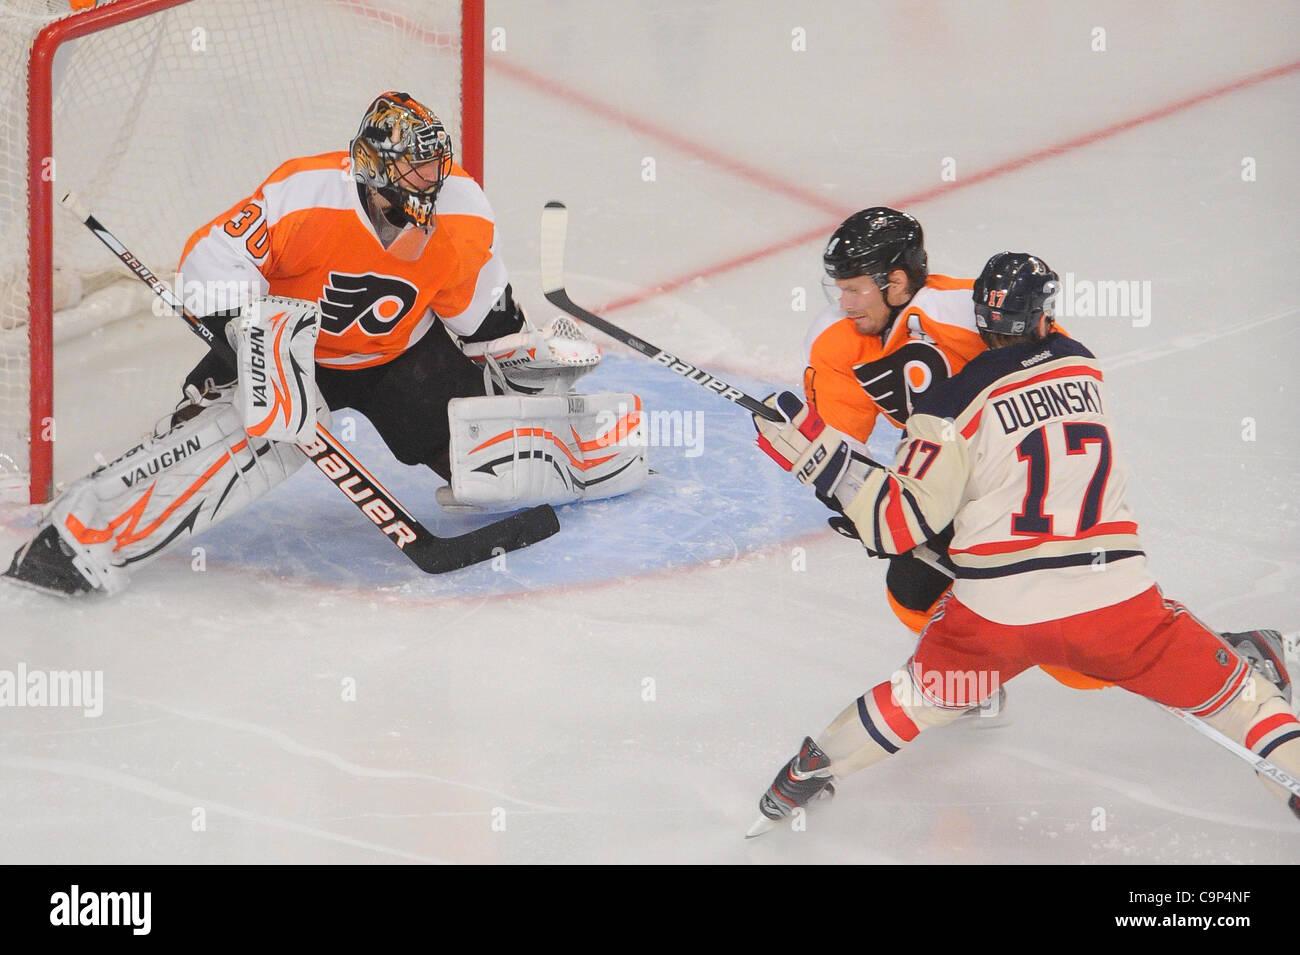 af66e9214 ... New Jersey, U.S. - Philadelphia Flyers goalie Ilya Bryzgalov Customize  Philadelphia Flyers Goalie Cut Authentic Retro Hockey Jersey Away White ...